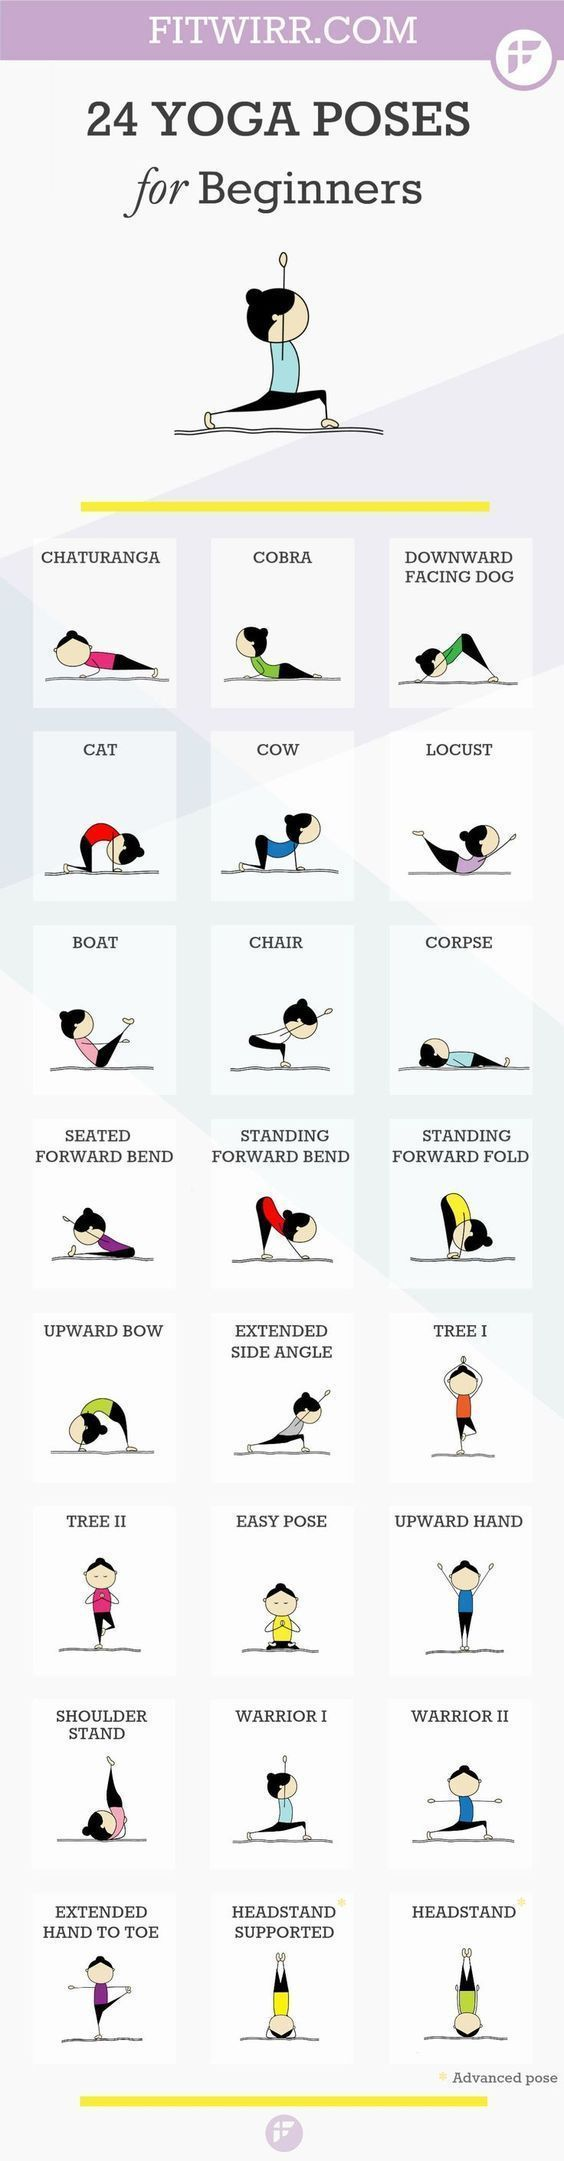 32 Suggestions: How to Start an Ashtanga Yoga Practice